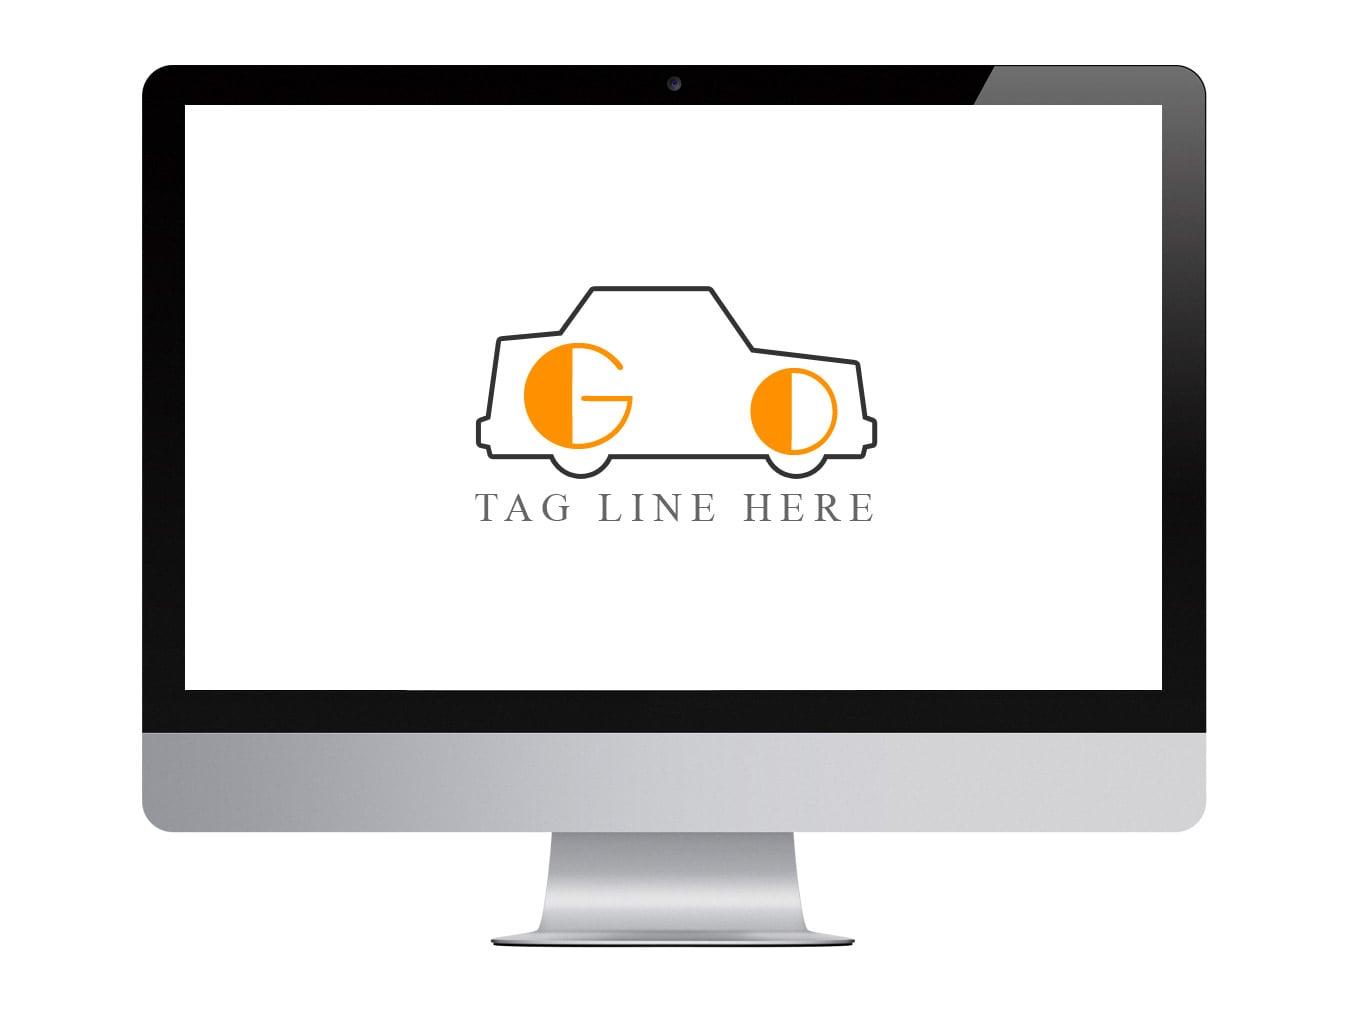 Cab logo free psd download